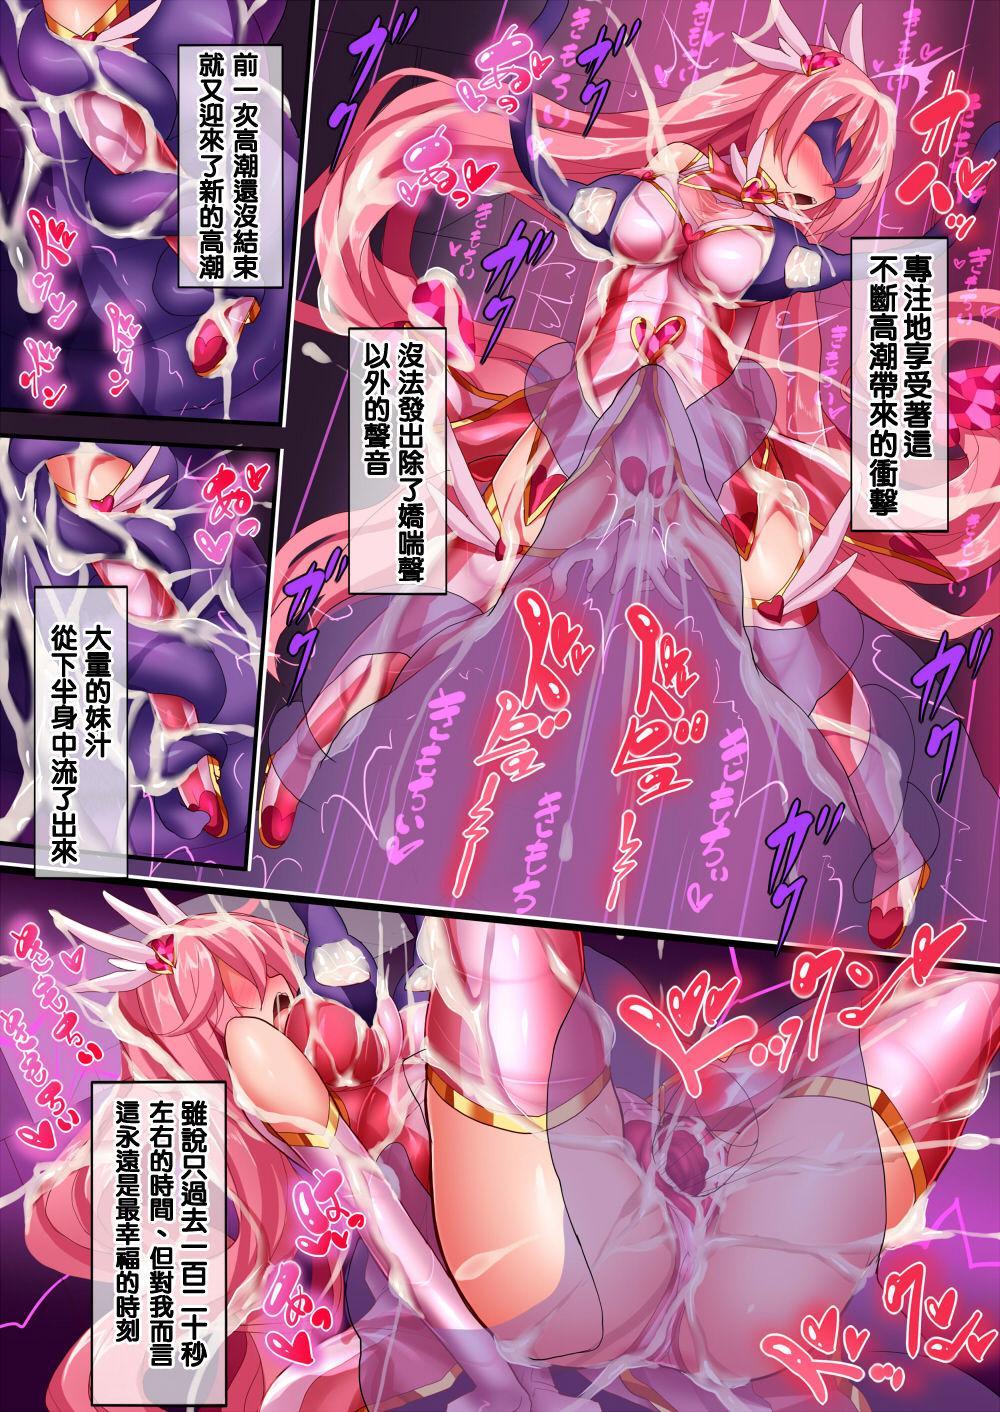 [Makutsutei (Nagai Wataru)] Orgasm Unit EX -Mahou Senshi Akari Ch. 1-5 [Chinese] [这很恶堕 x Lolipoi汉化组] 28